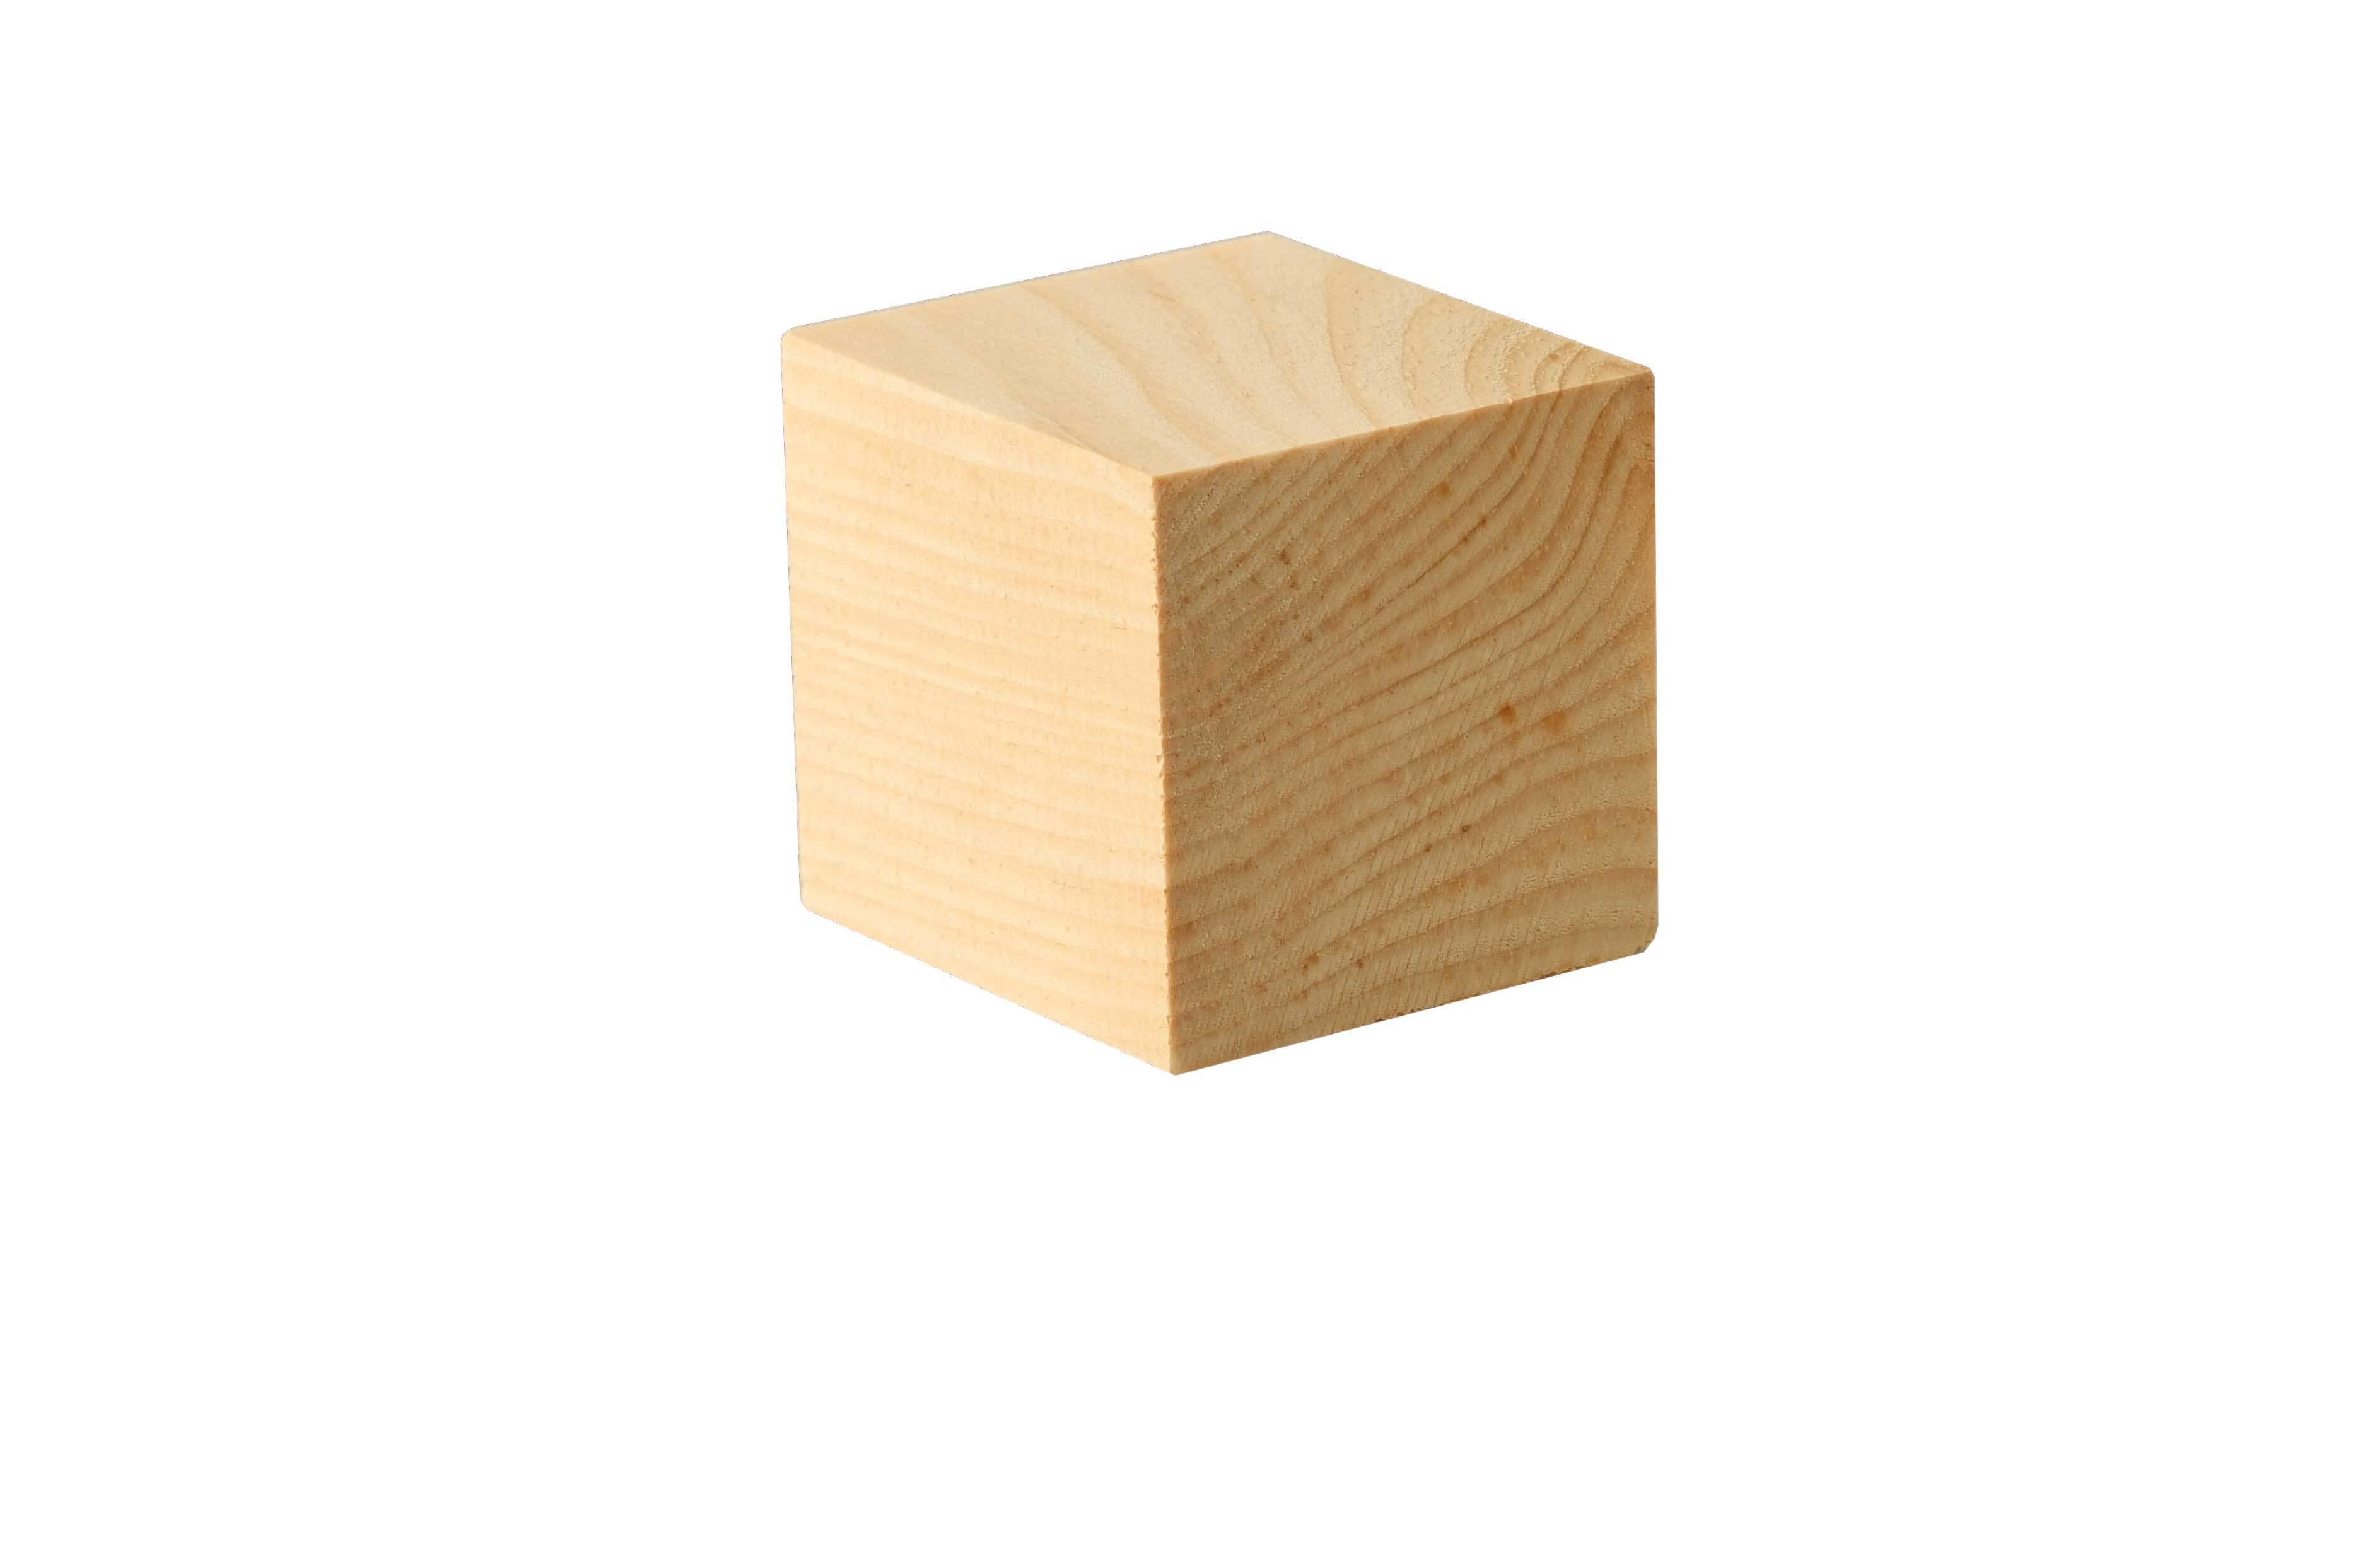 Houten blokjes groot - 50 st., 42 x 42 cm